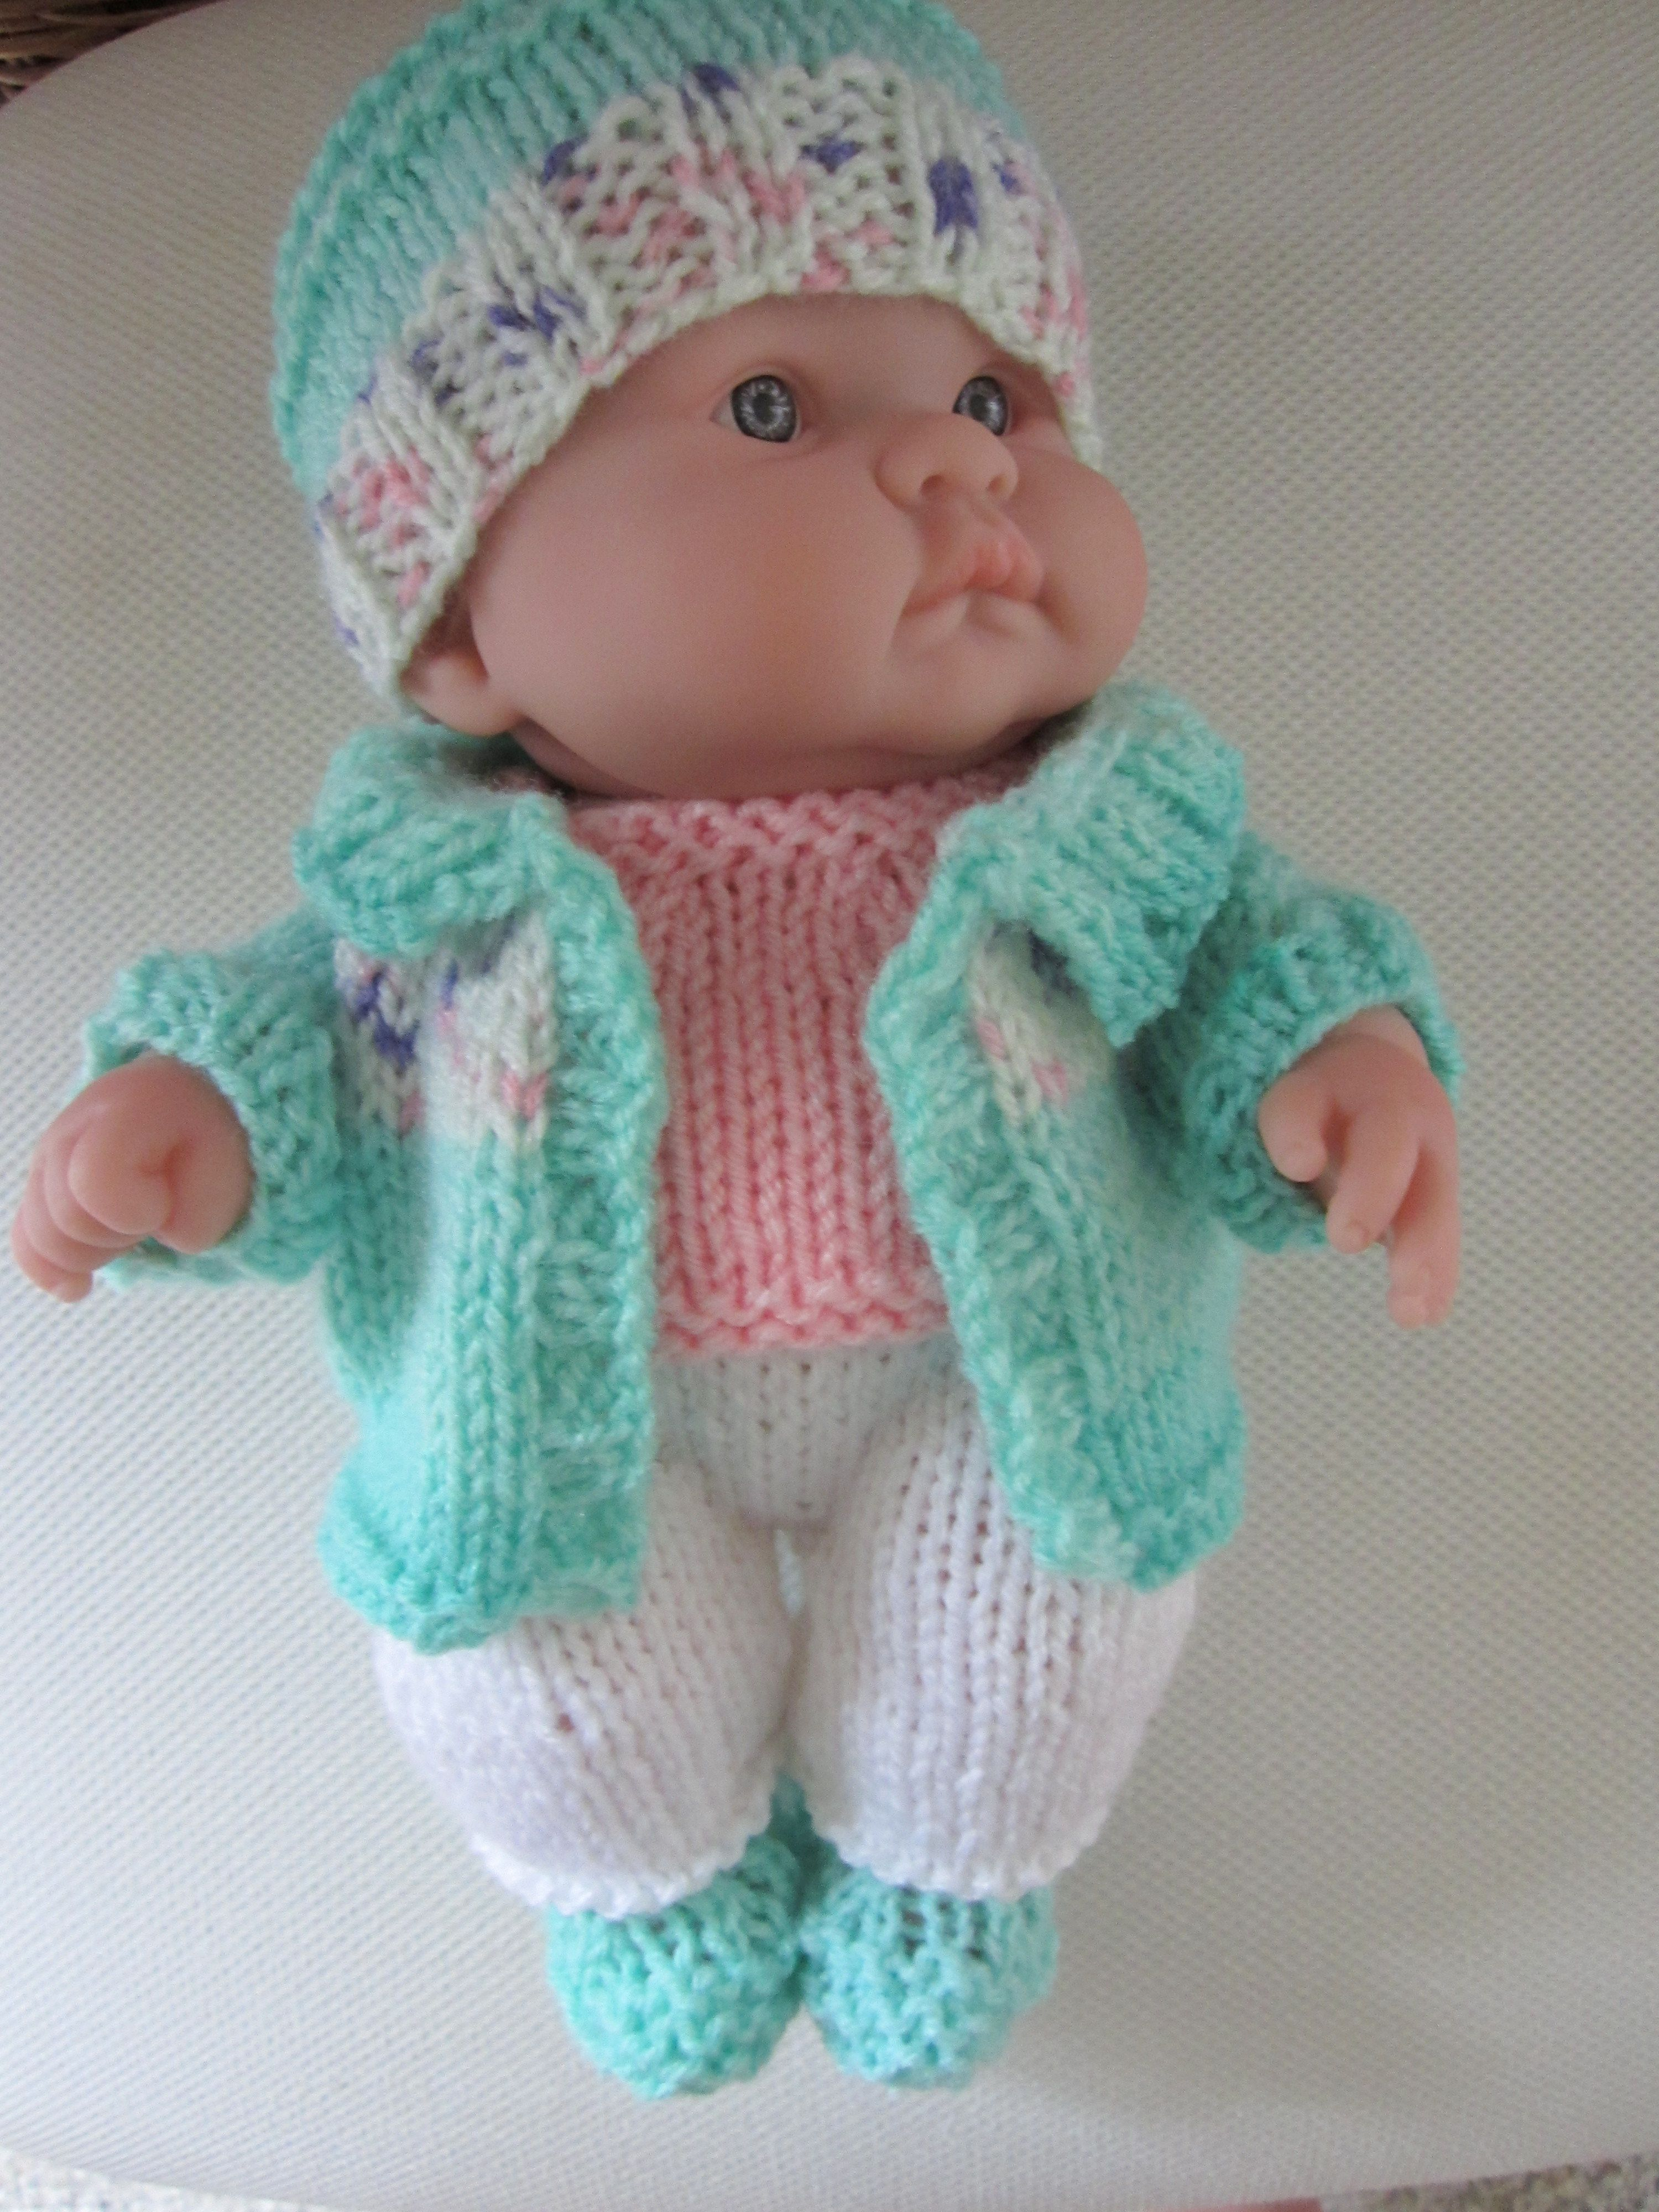 10 inch berenguer knit jacket and pants set